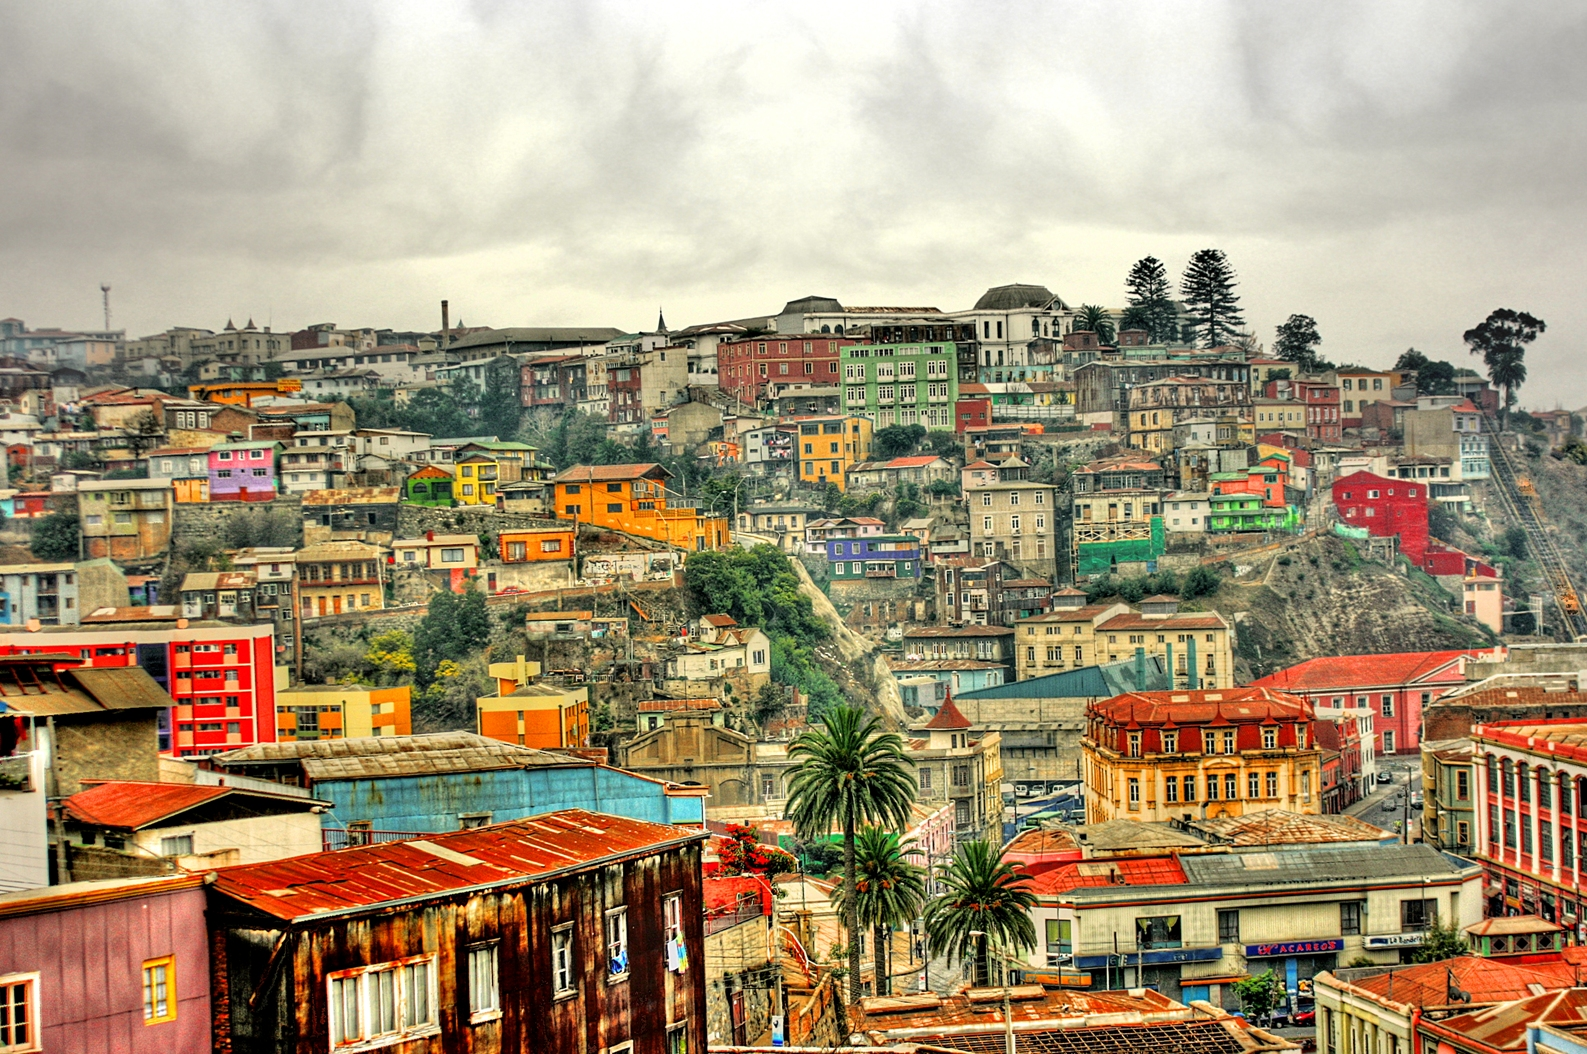 010 Valparaiso_Color_Patrimonial